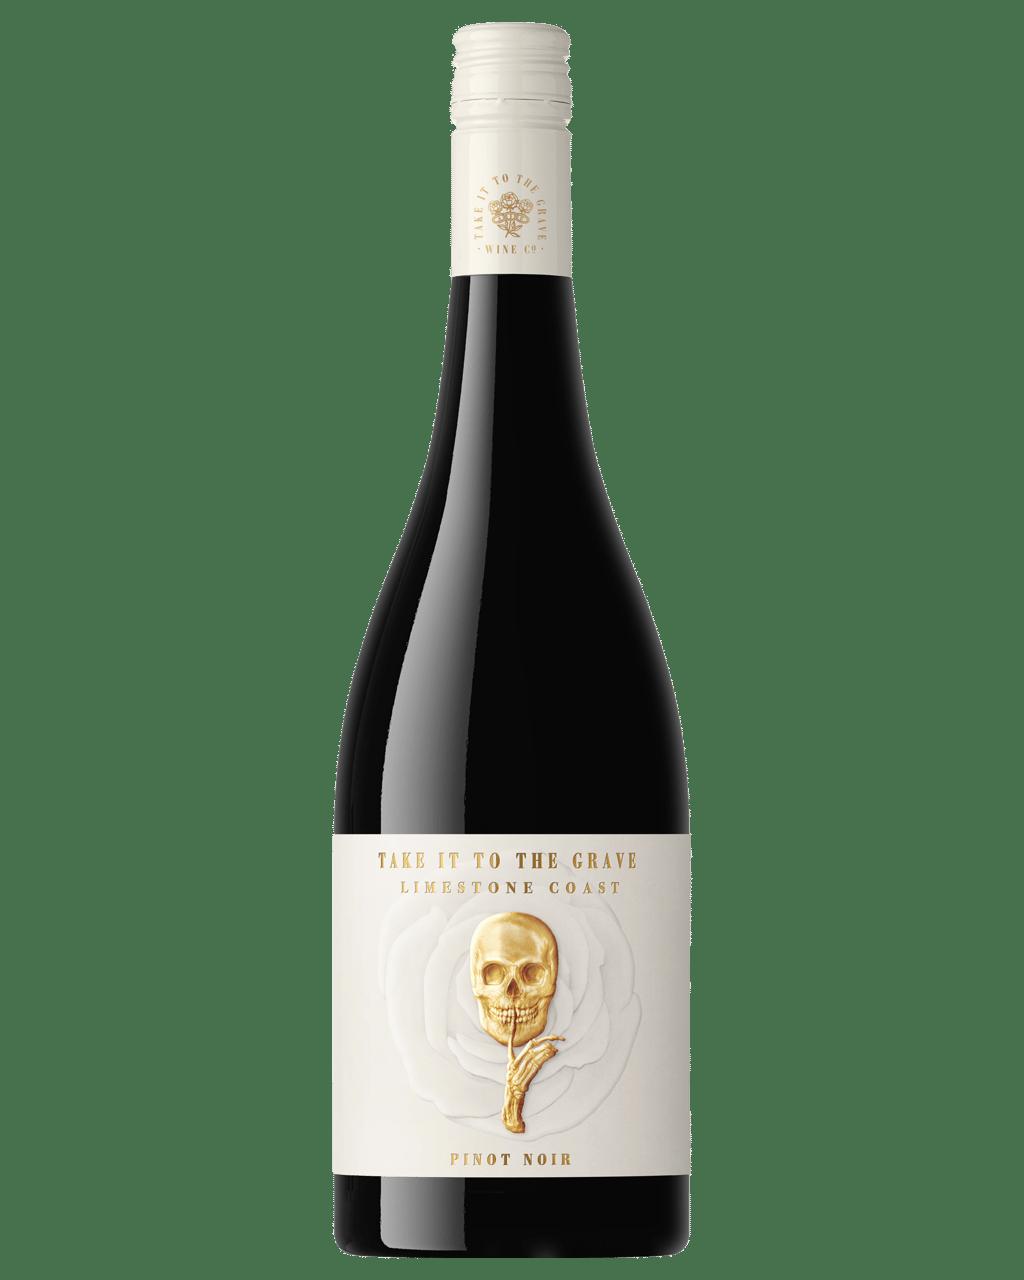 622a1ced607 Buy Take It To The Grave Pinot Noir | Dan Murphy's